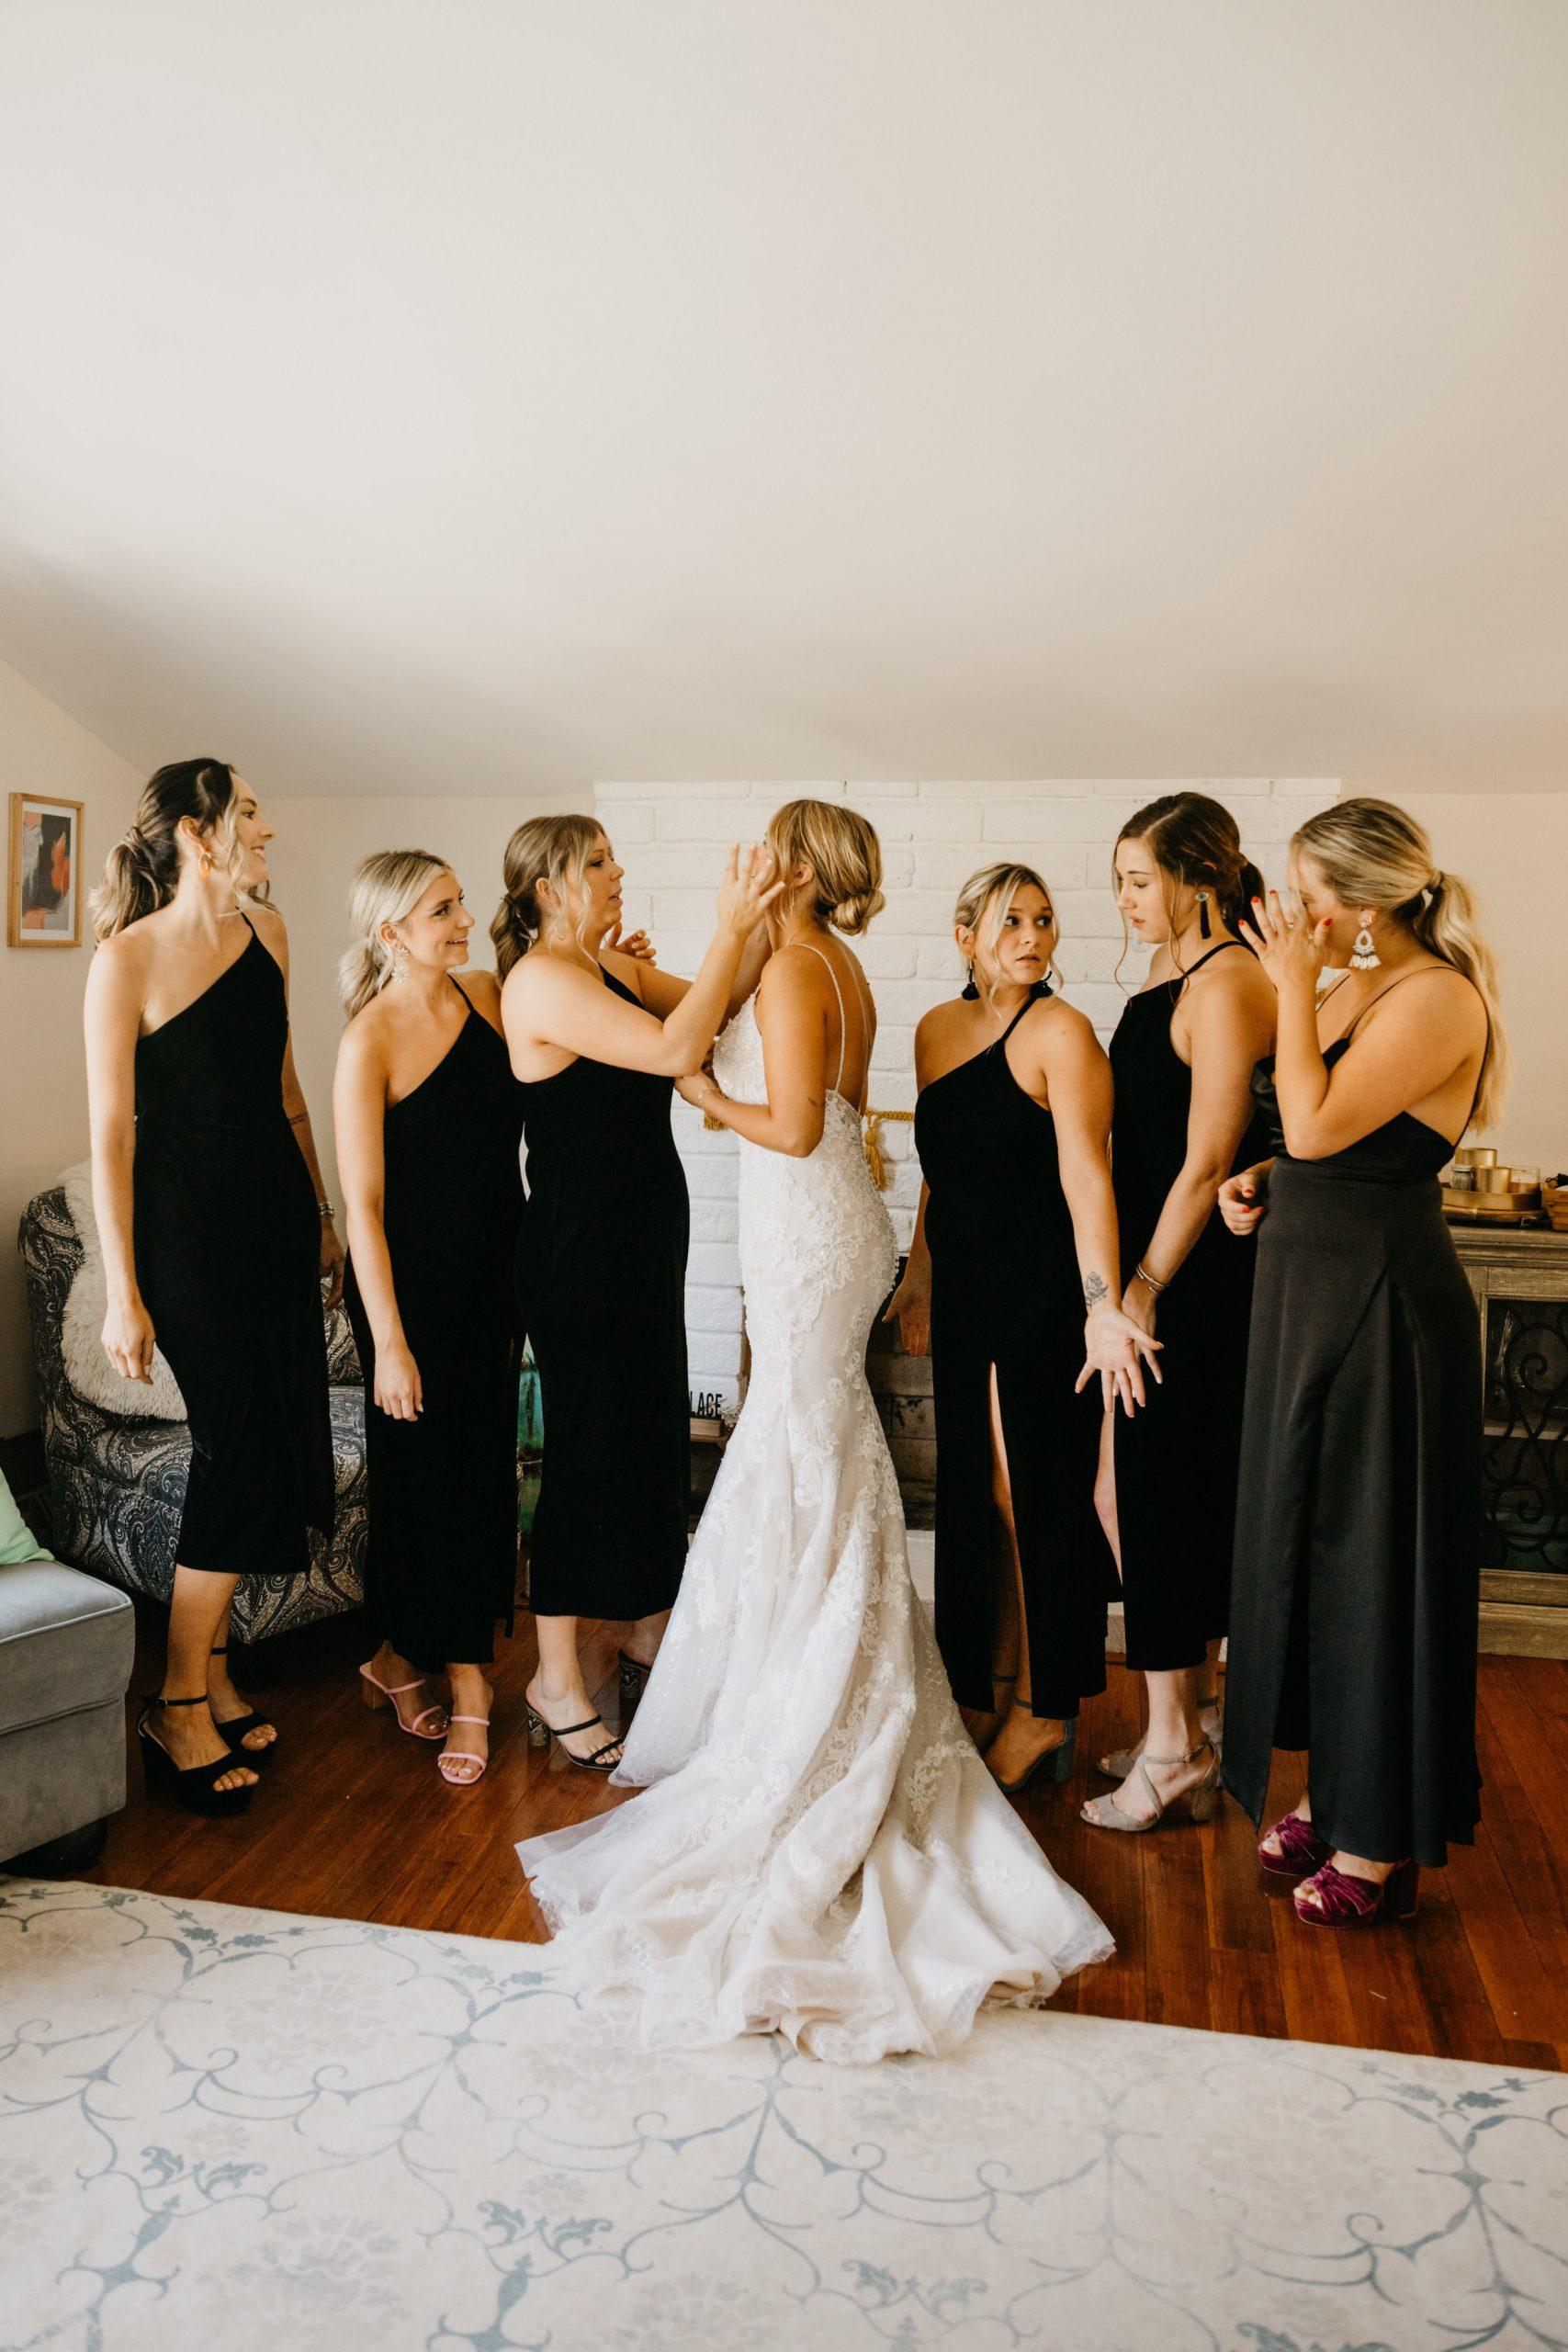 Bridesmaids dress reveal, image by Fatima Elreda Photo